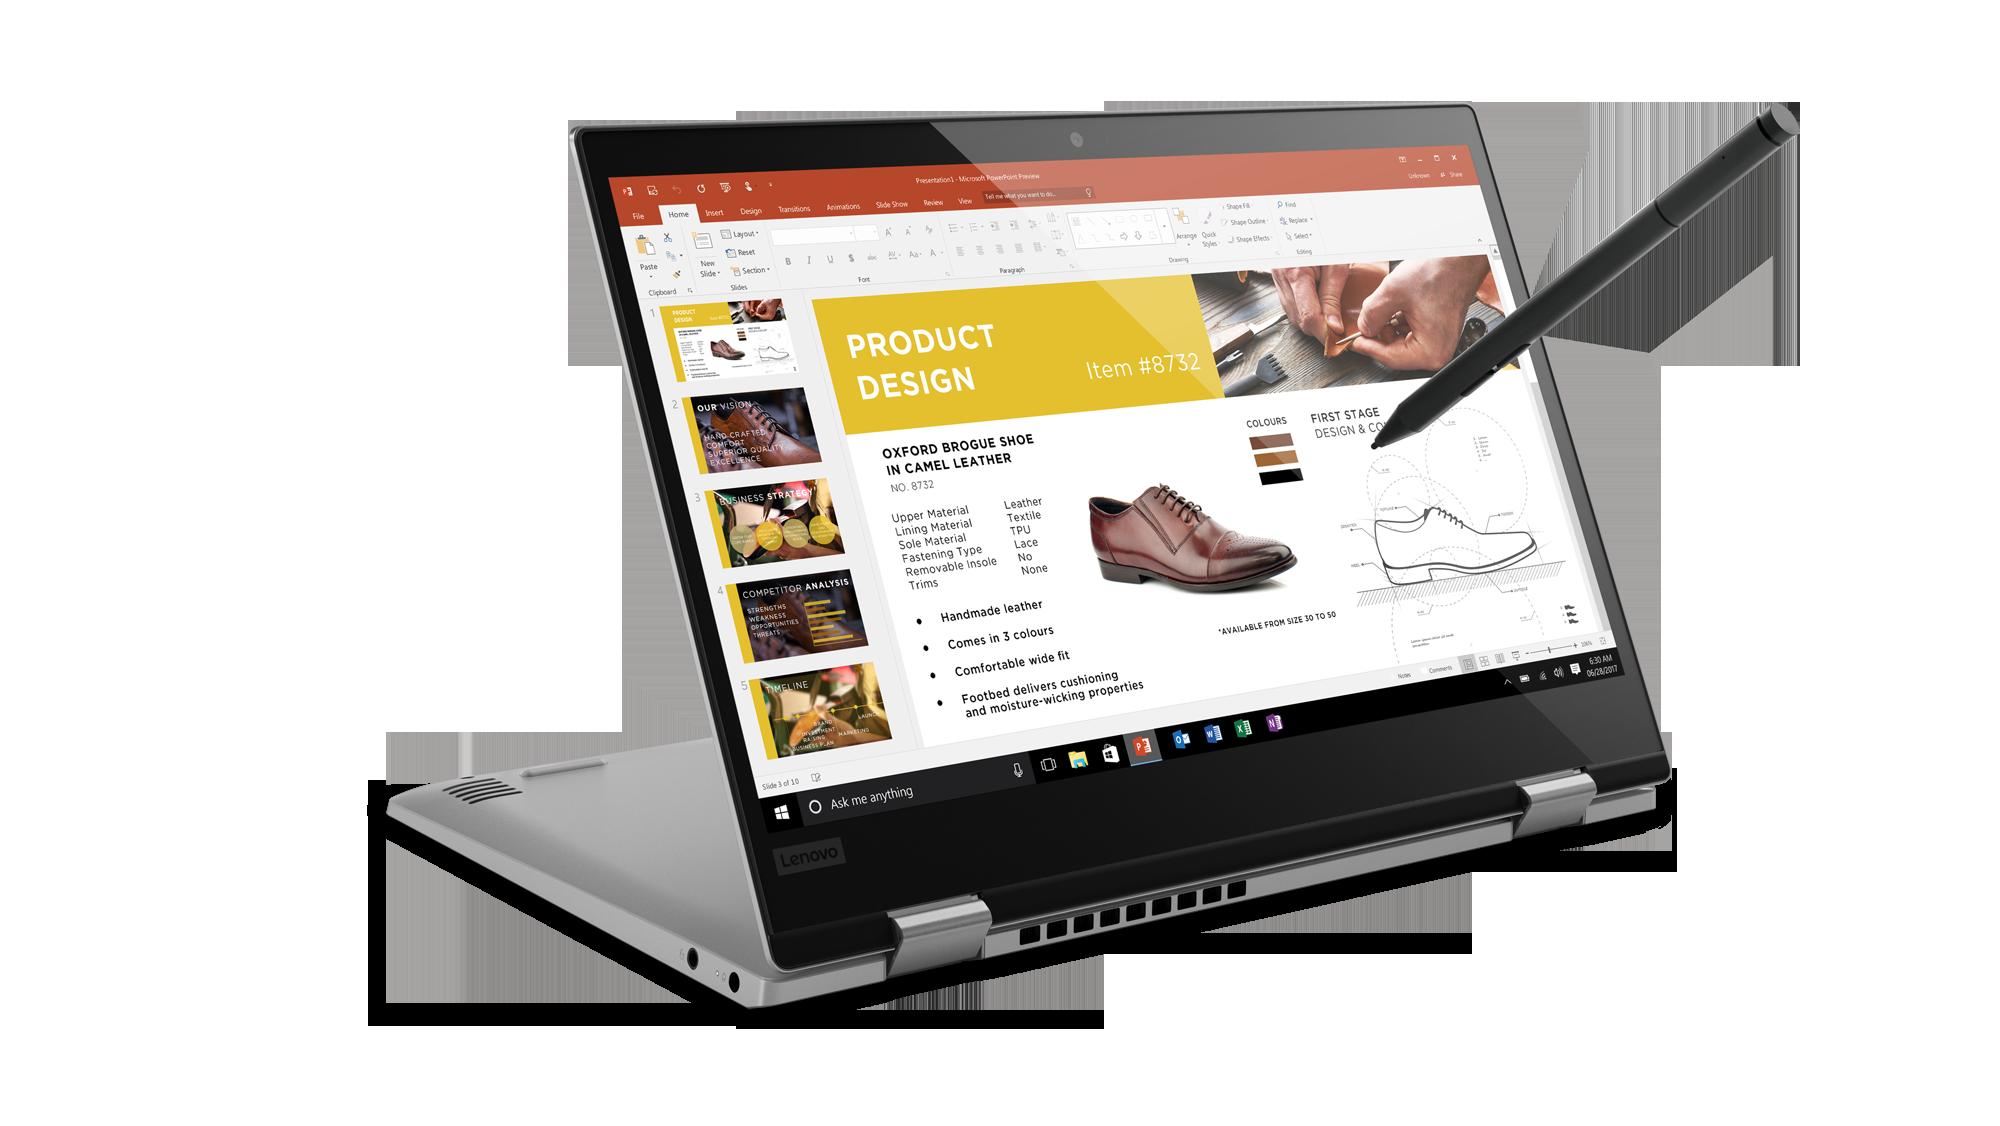 laptops, latest, lenovo, lenovo yoga series, notebooks, yoga series, lenovo yoga 720